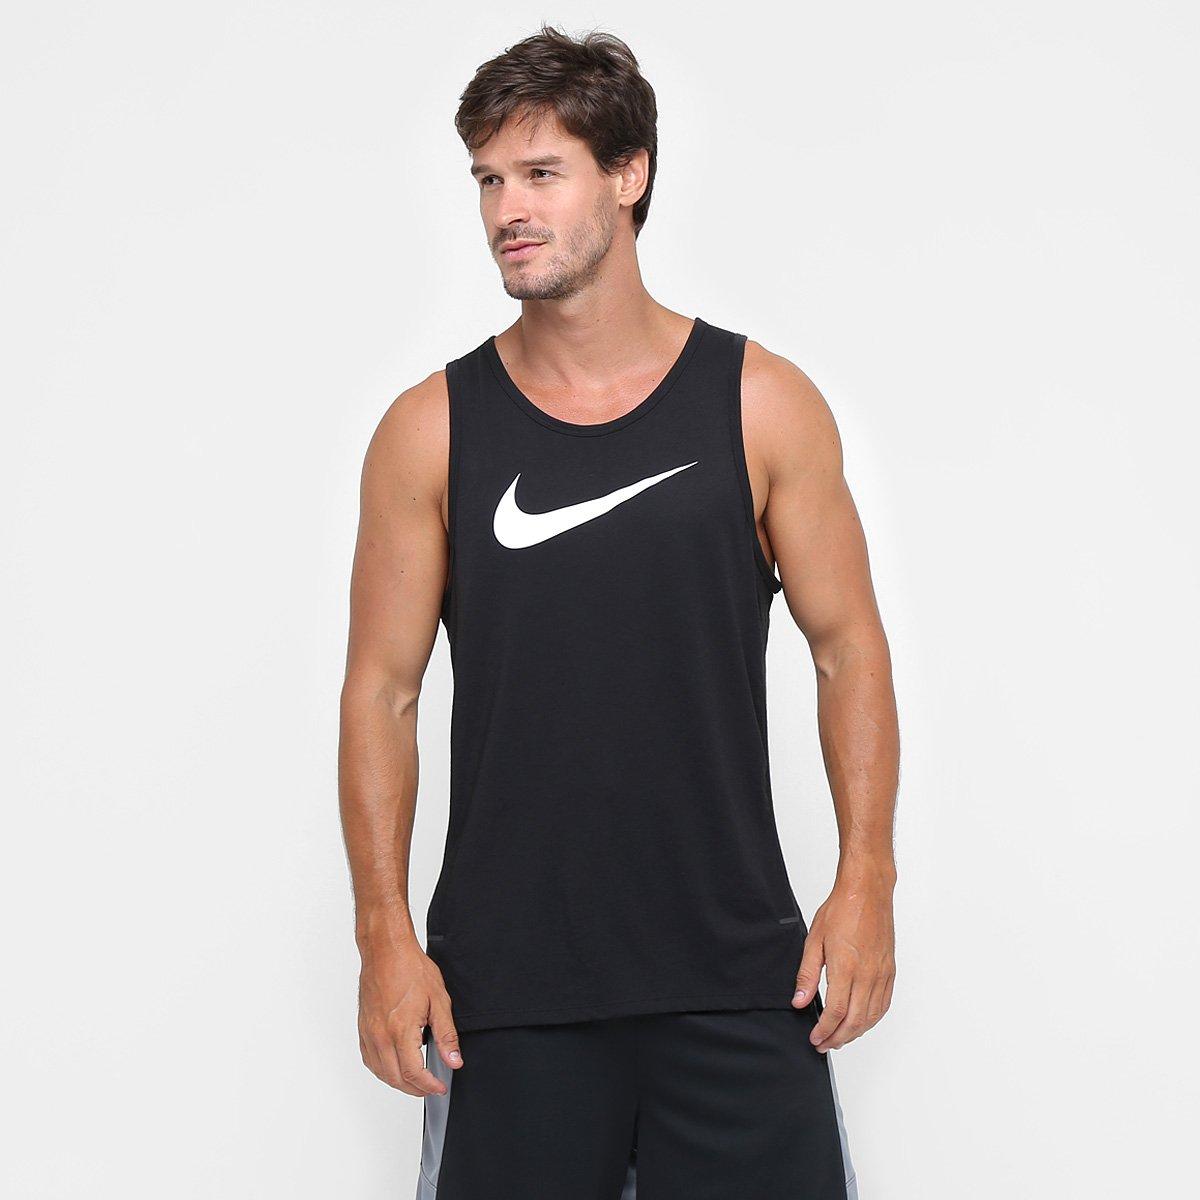 Camiseta Regata Nike Top SL Elite Masculina - Compre Agora  12d1878b0eb